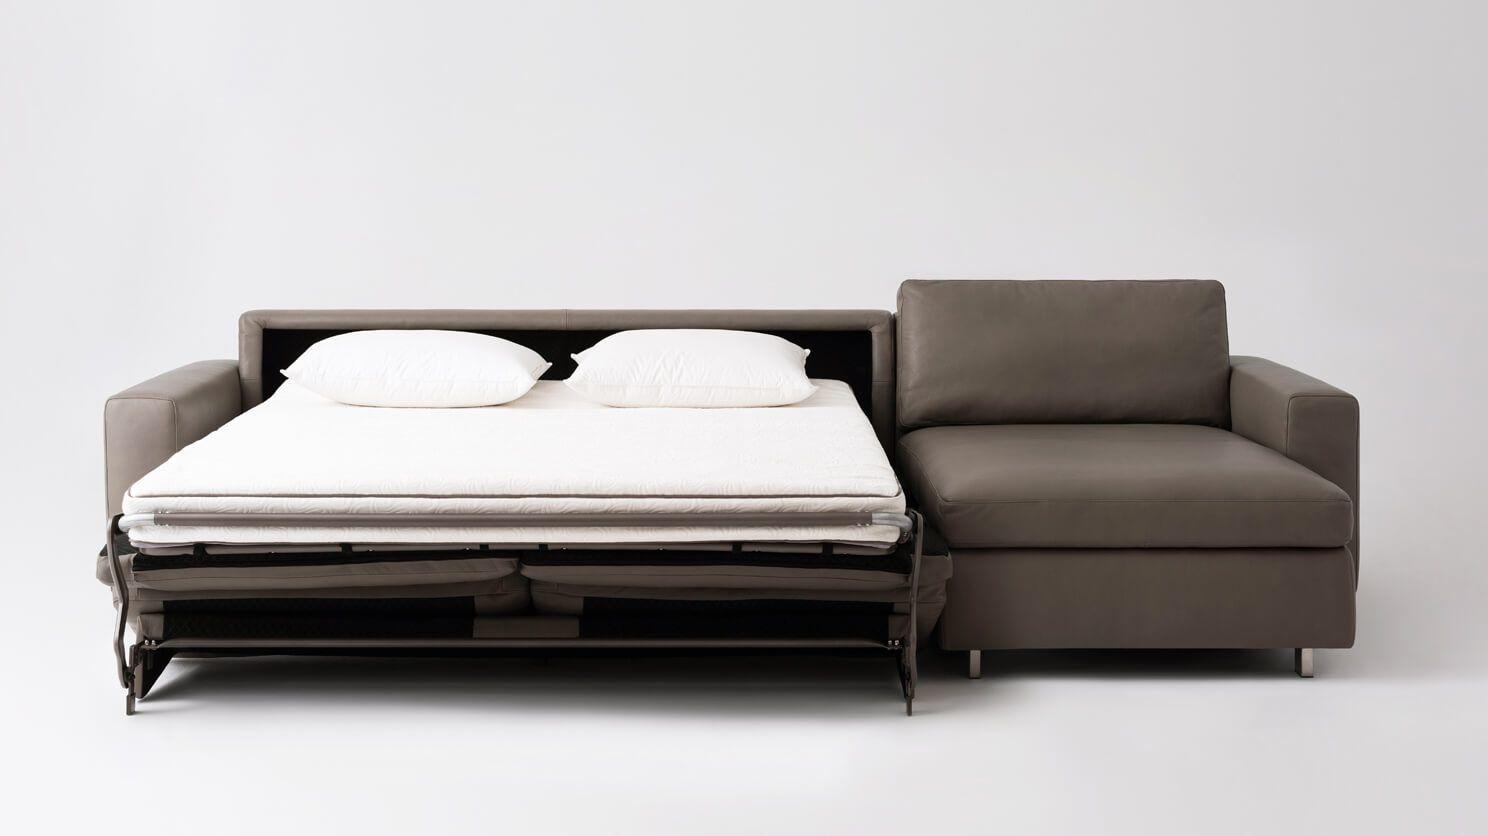 Reva 2 Piece Sectional Sleeper Sofa With Storage Chaise Sectional Sleeper Sofa Sleeper Sofa Queen Sofa Sleeper